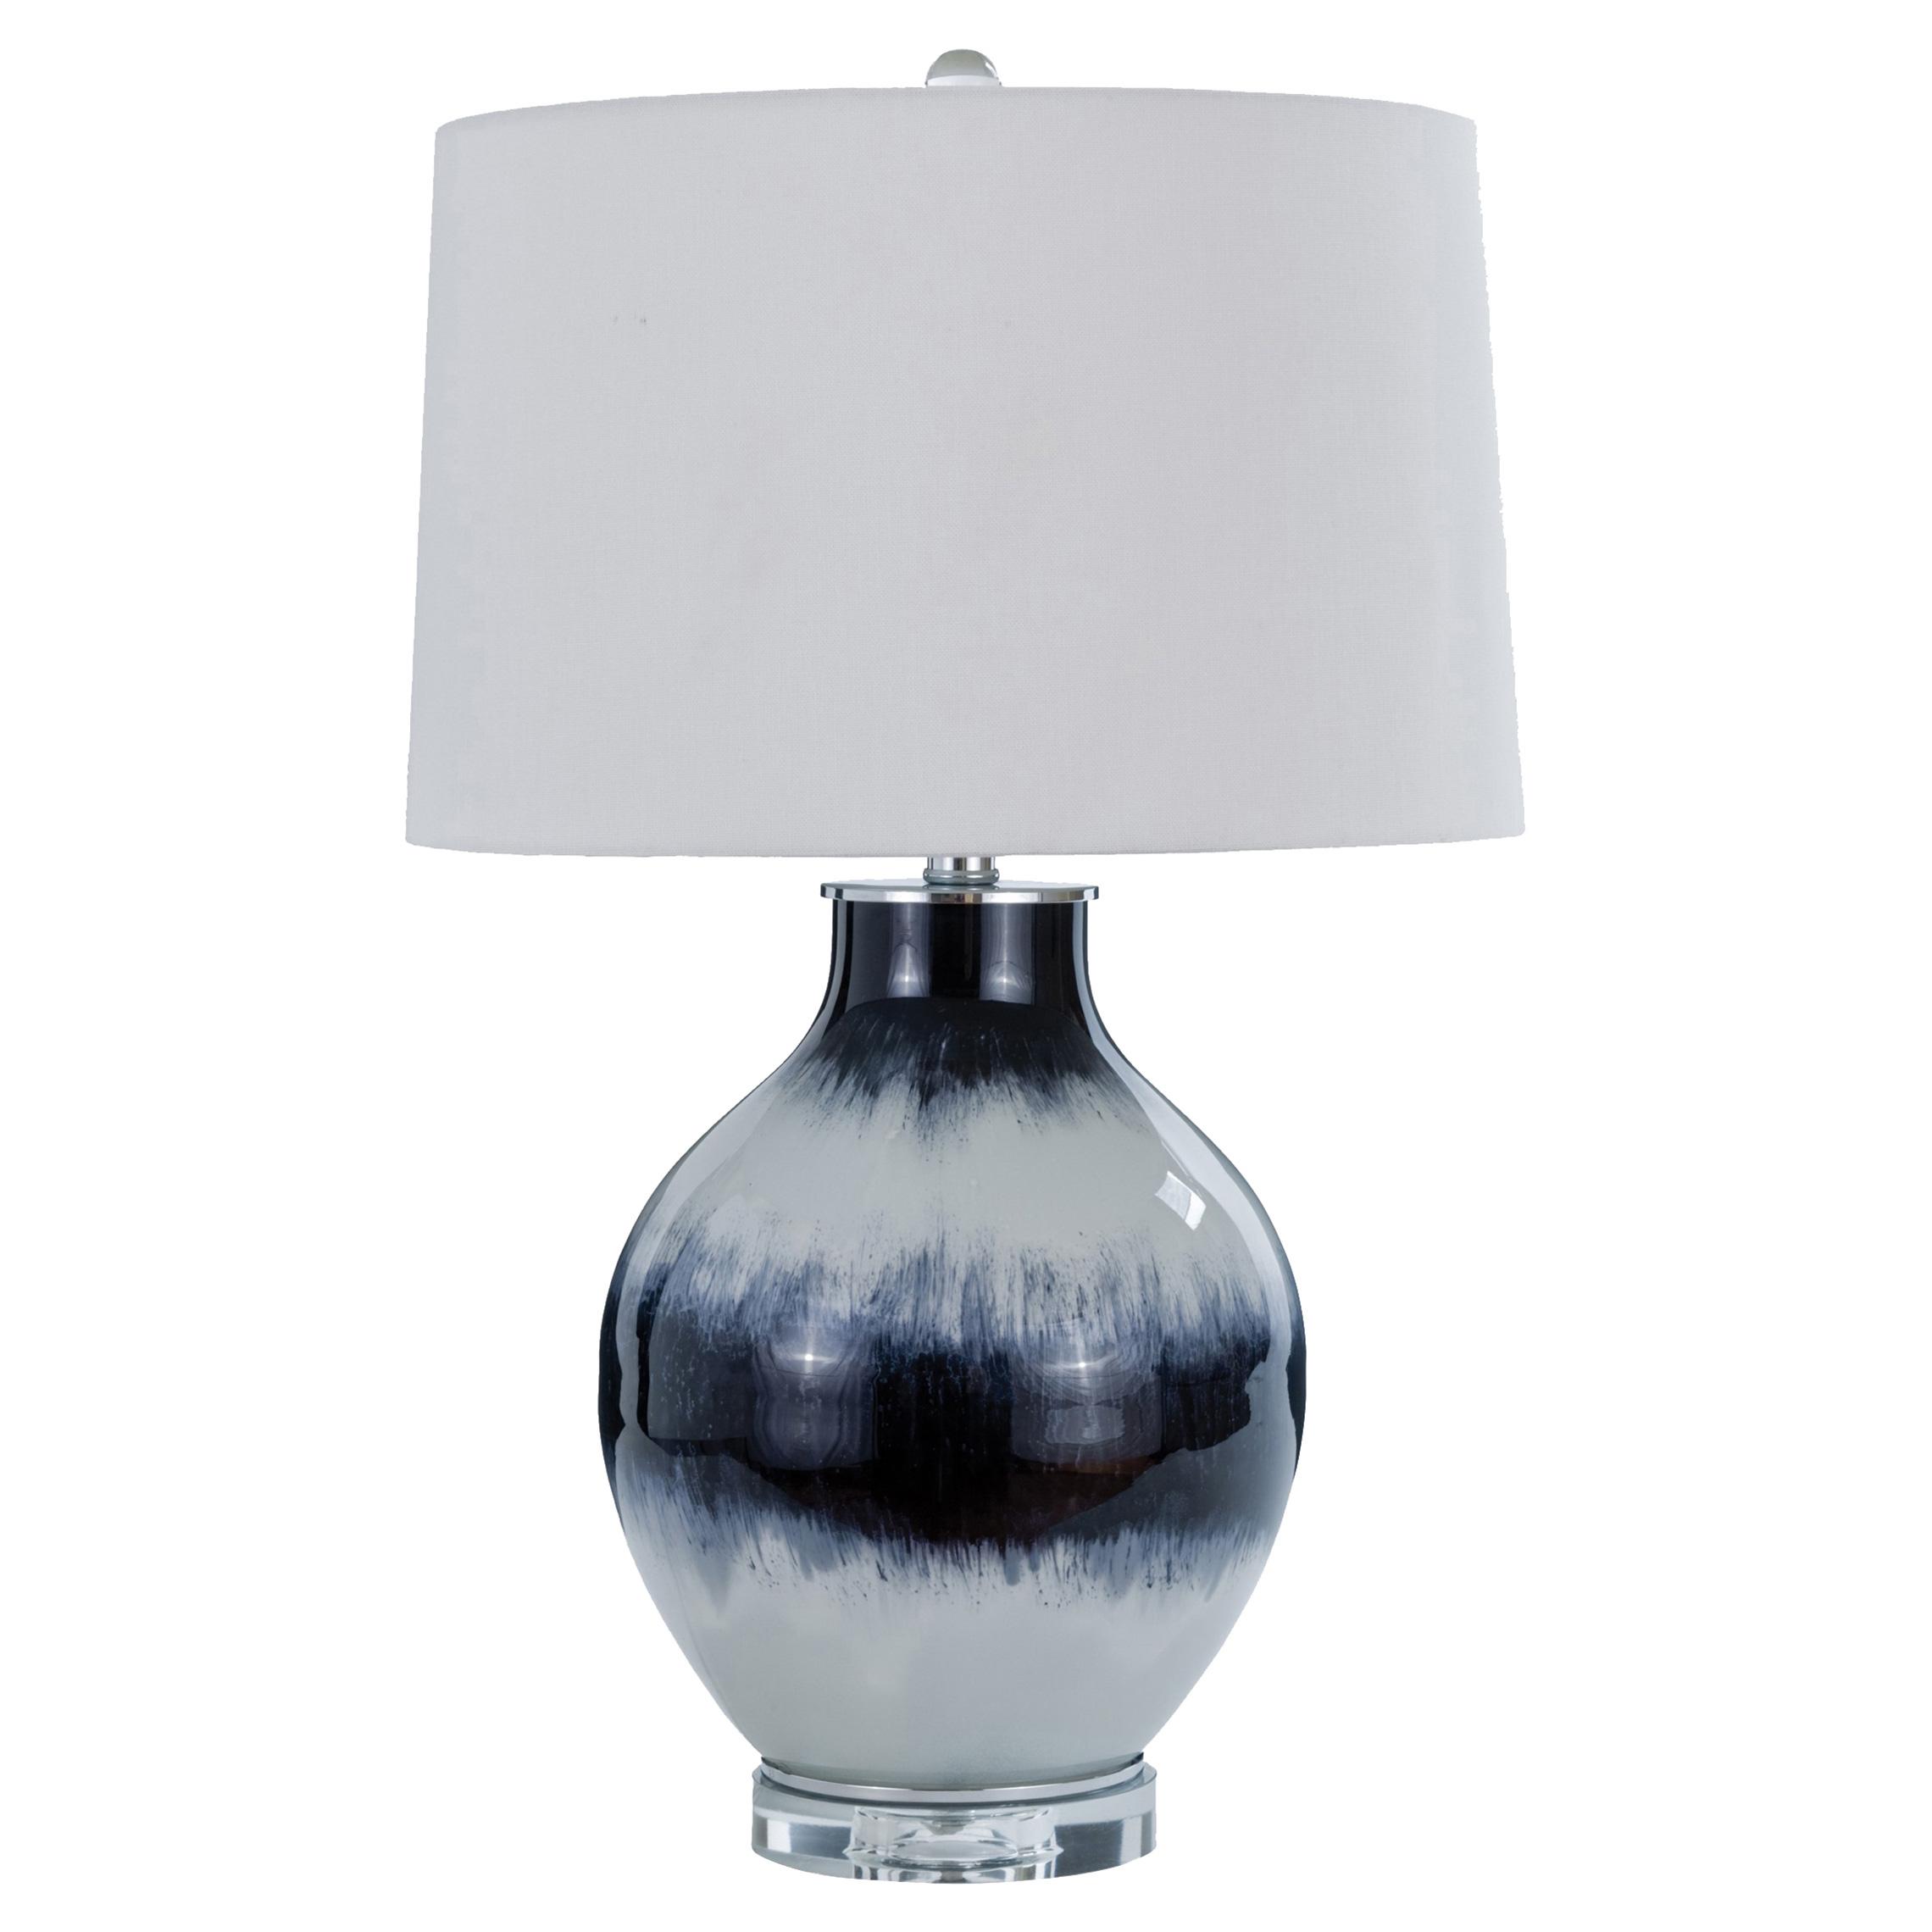 Caledonia Coastal Beach Indigo Ombre Glass Table Lamp